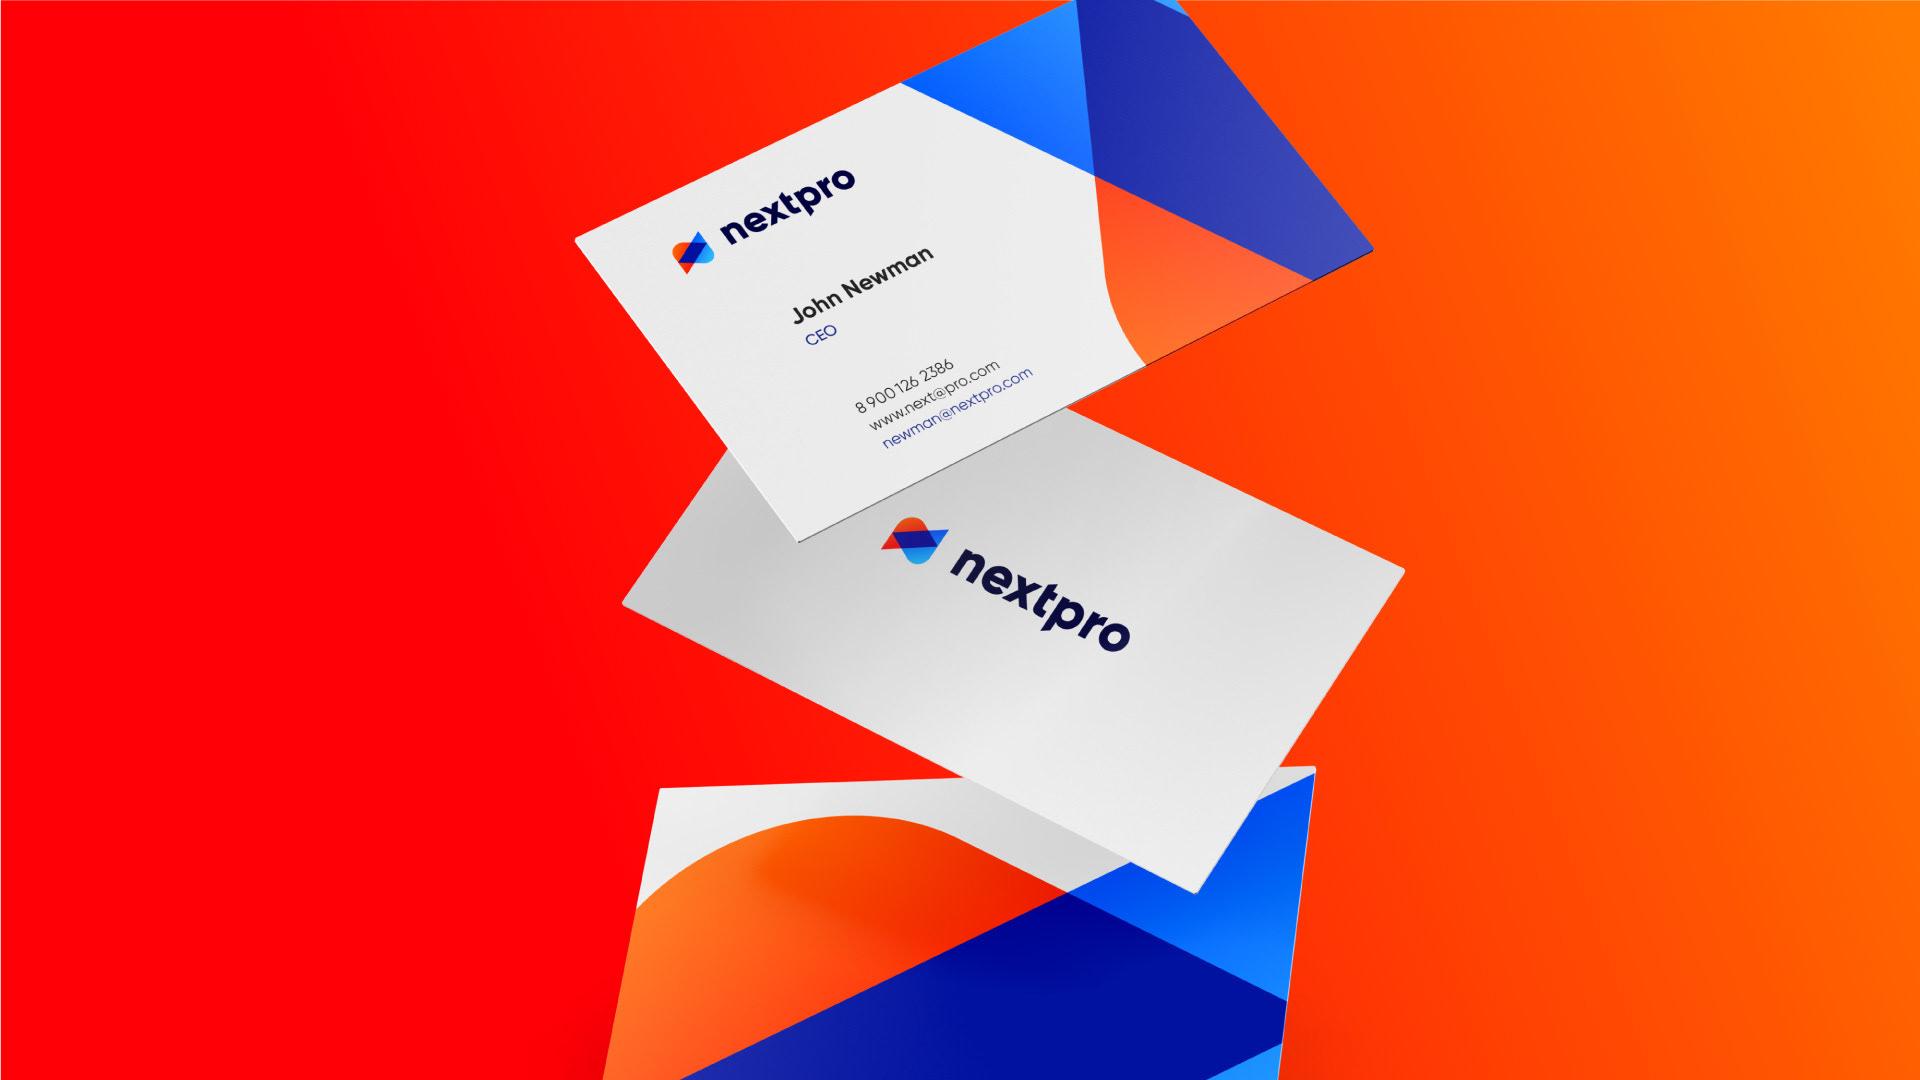 NextPro